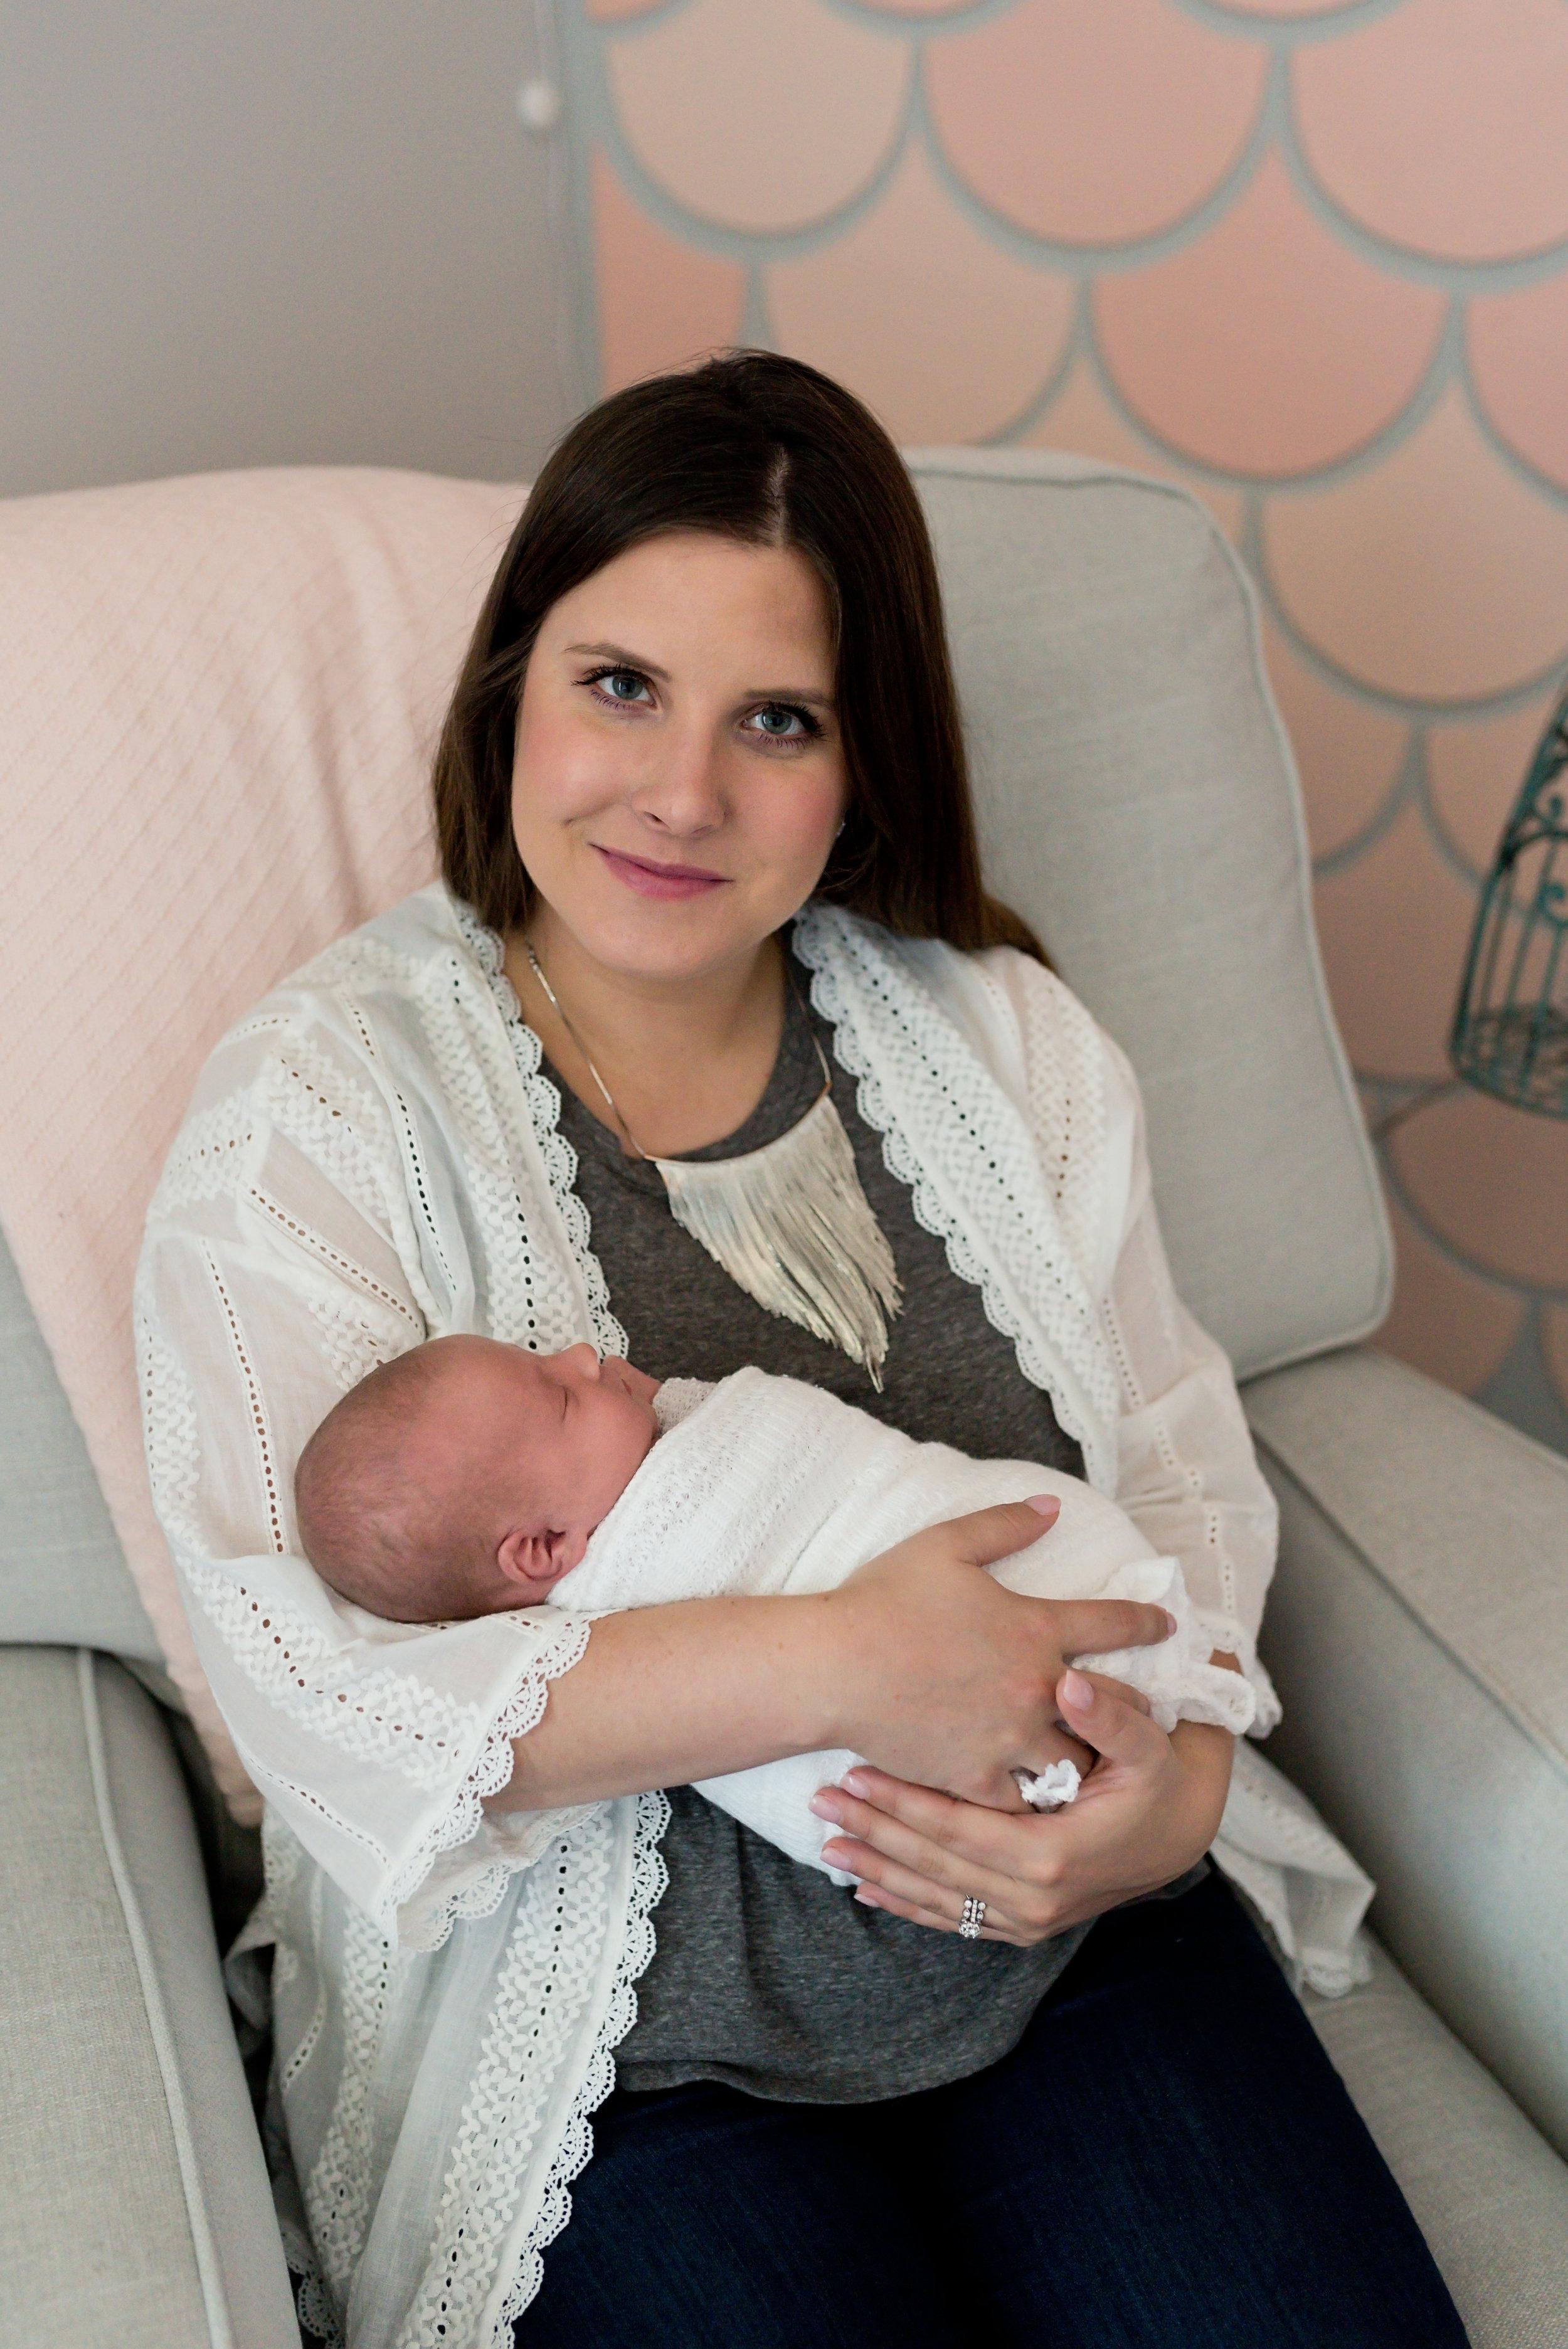 Charleston-Lifestyle-Newborn-Photographer-Following-Seas-Photography-7793 copy.jpg